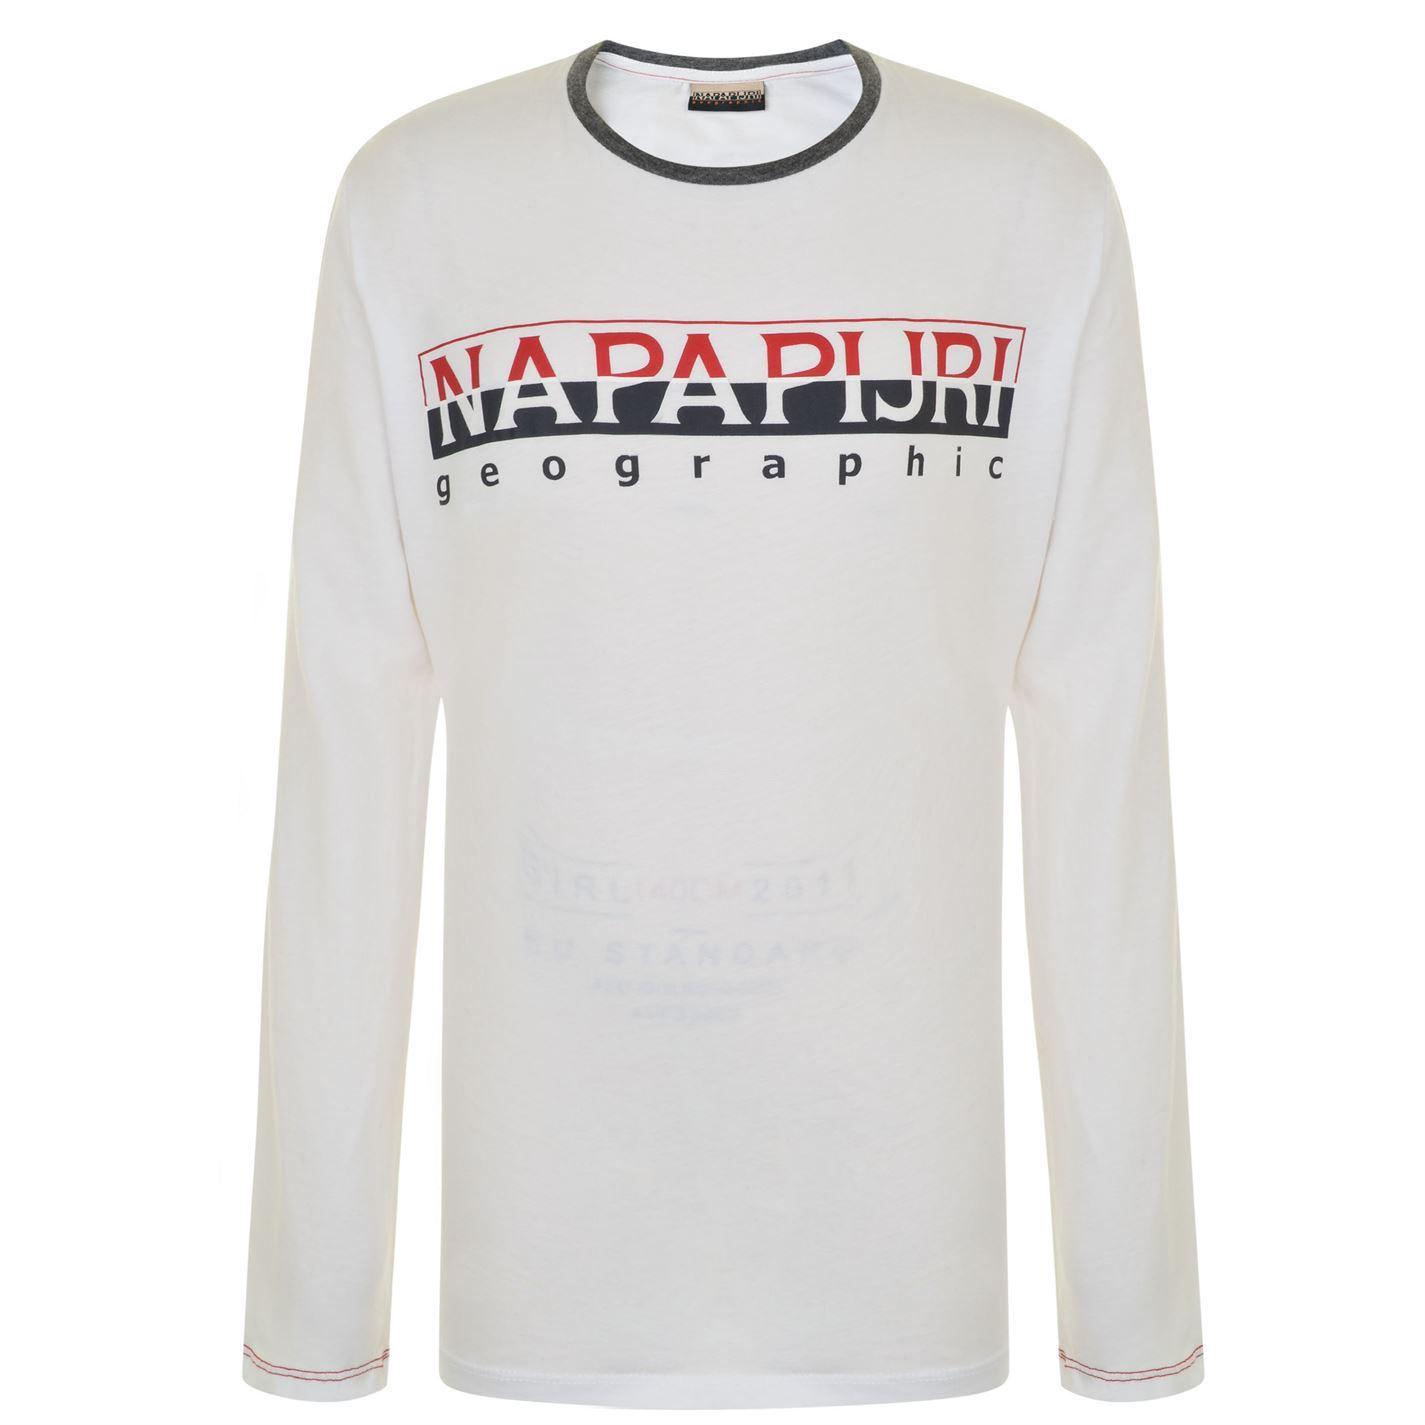 83488a8ccfd6 Details about Kids Boys Napapijri Sabin T Shirt Crew Neck Long Sleeve New